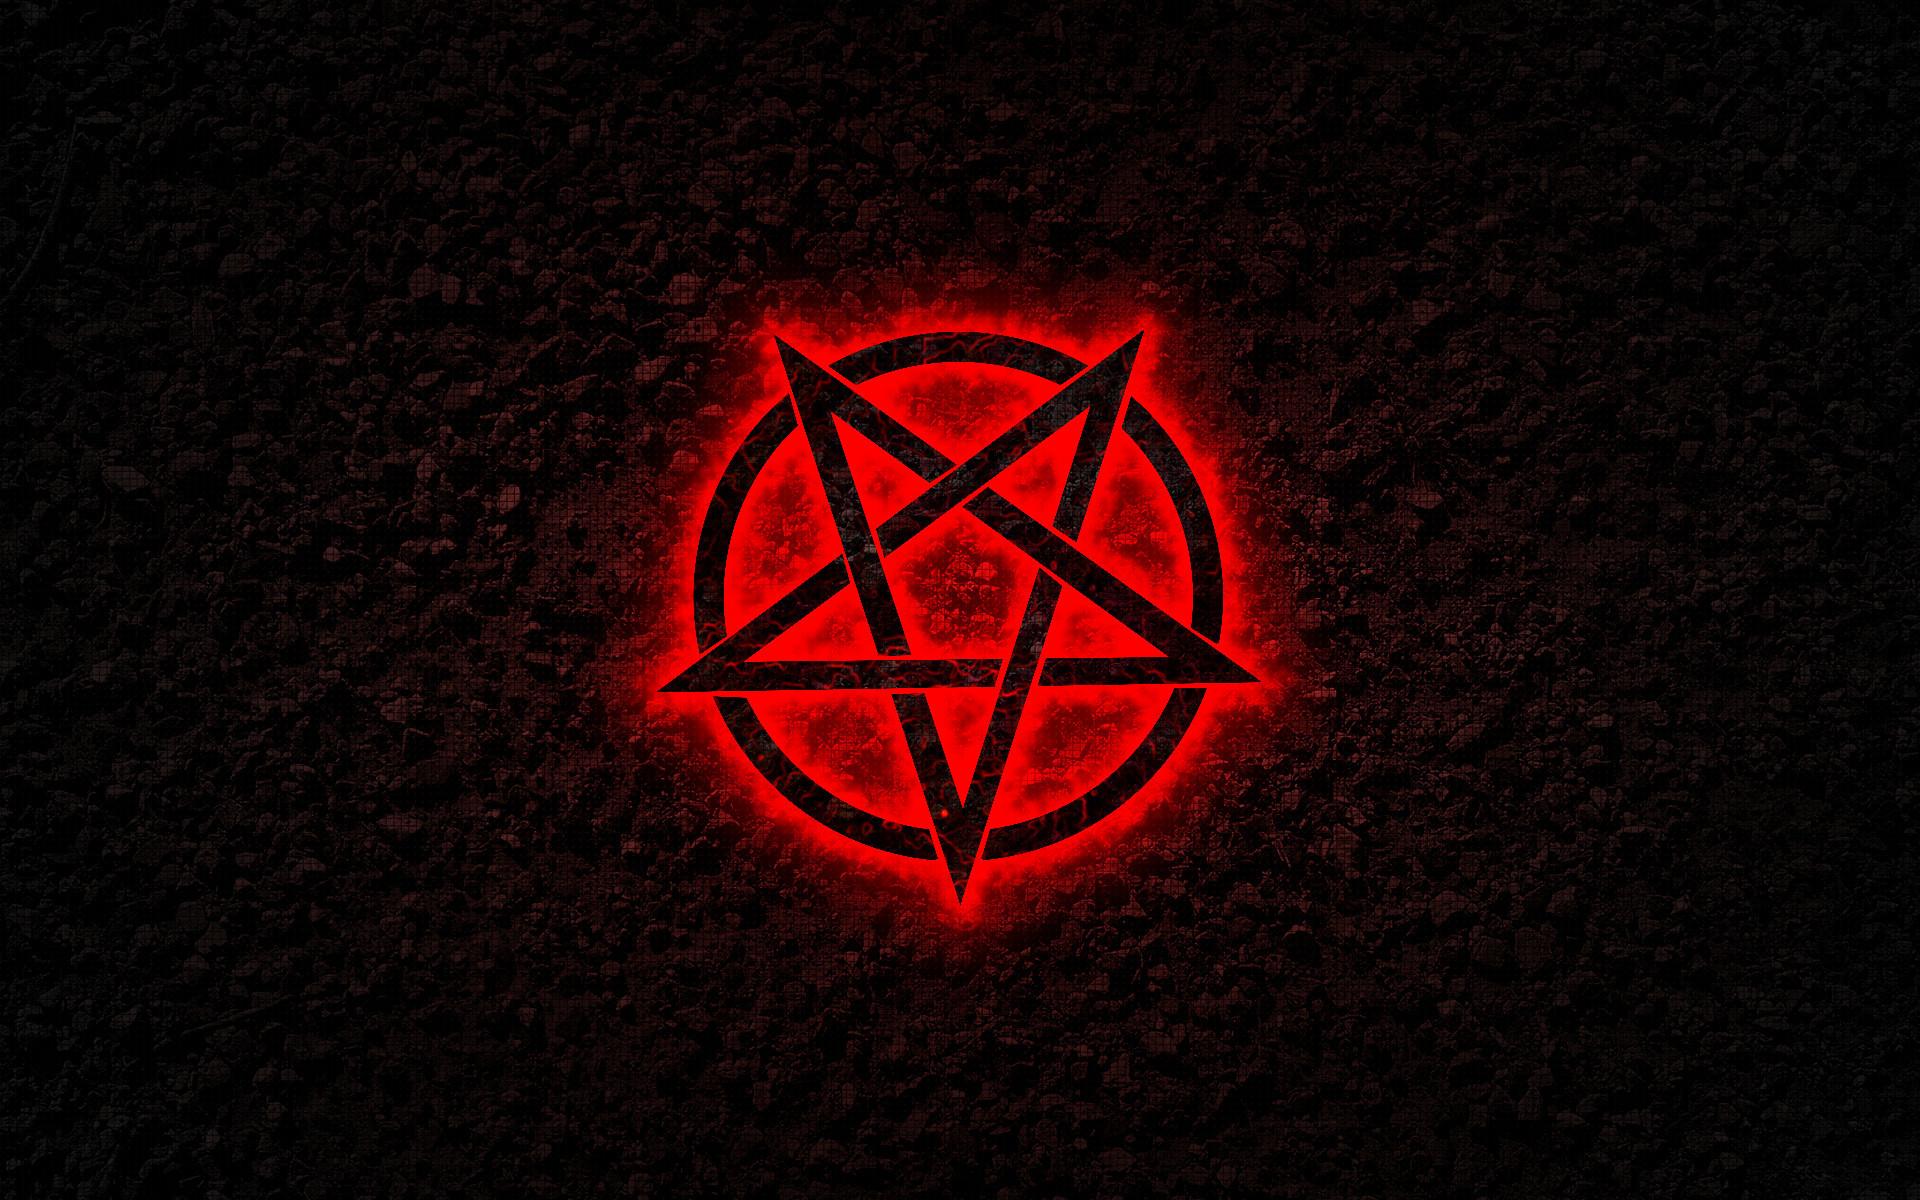 21 Satan Desktop Wallpaper posted by Sarah Cunningham